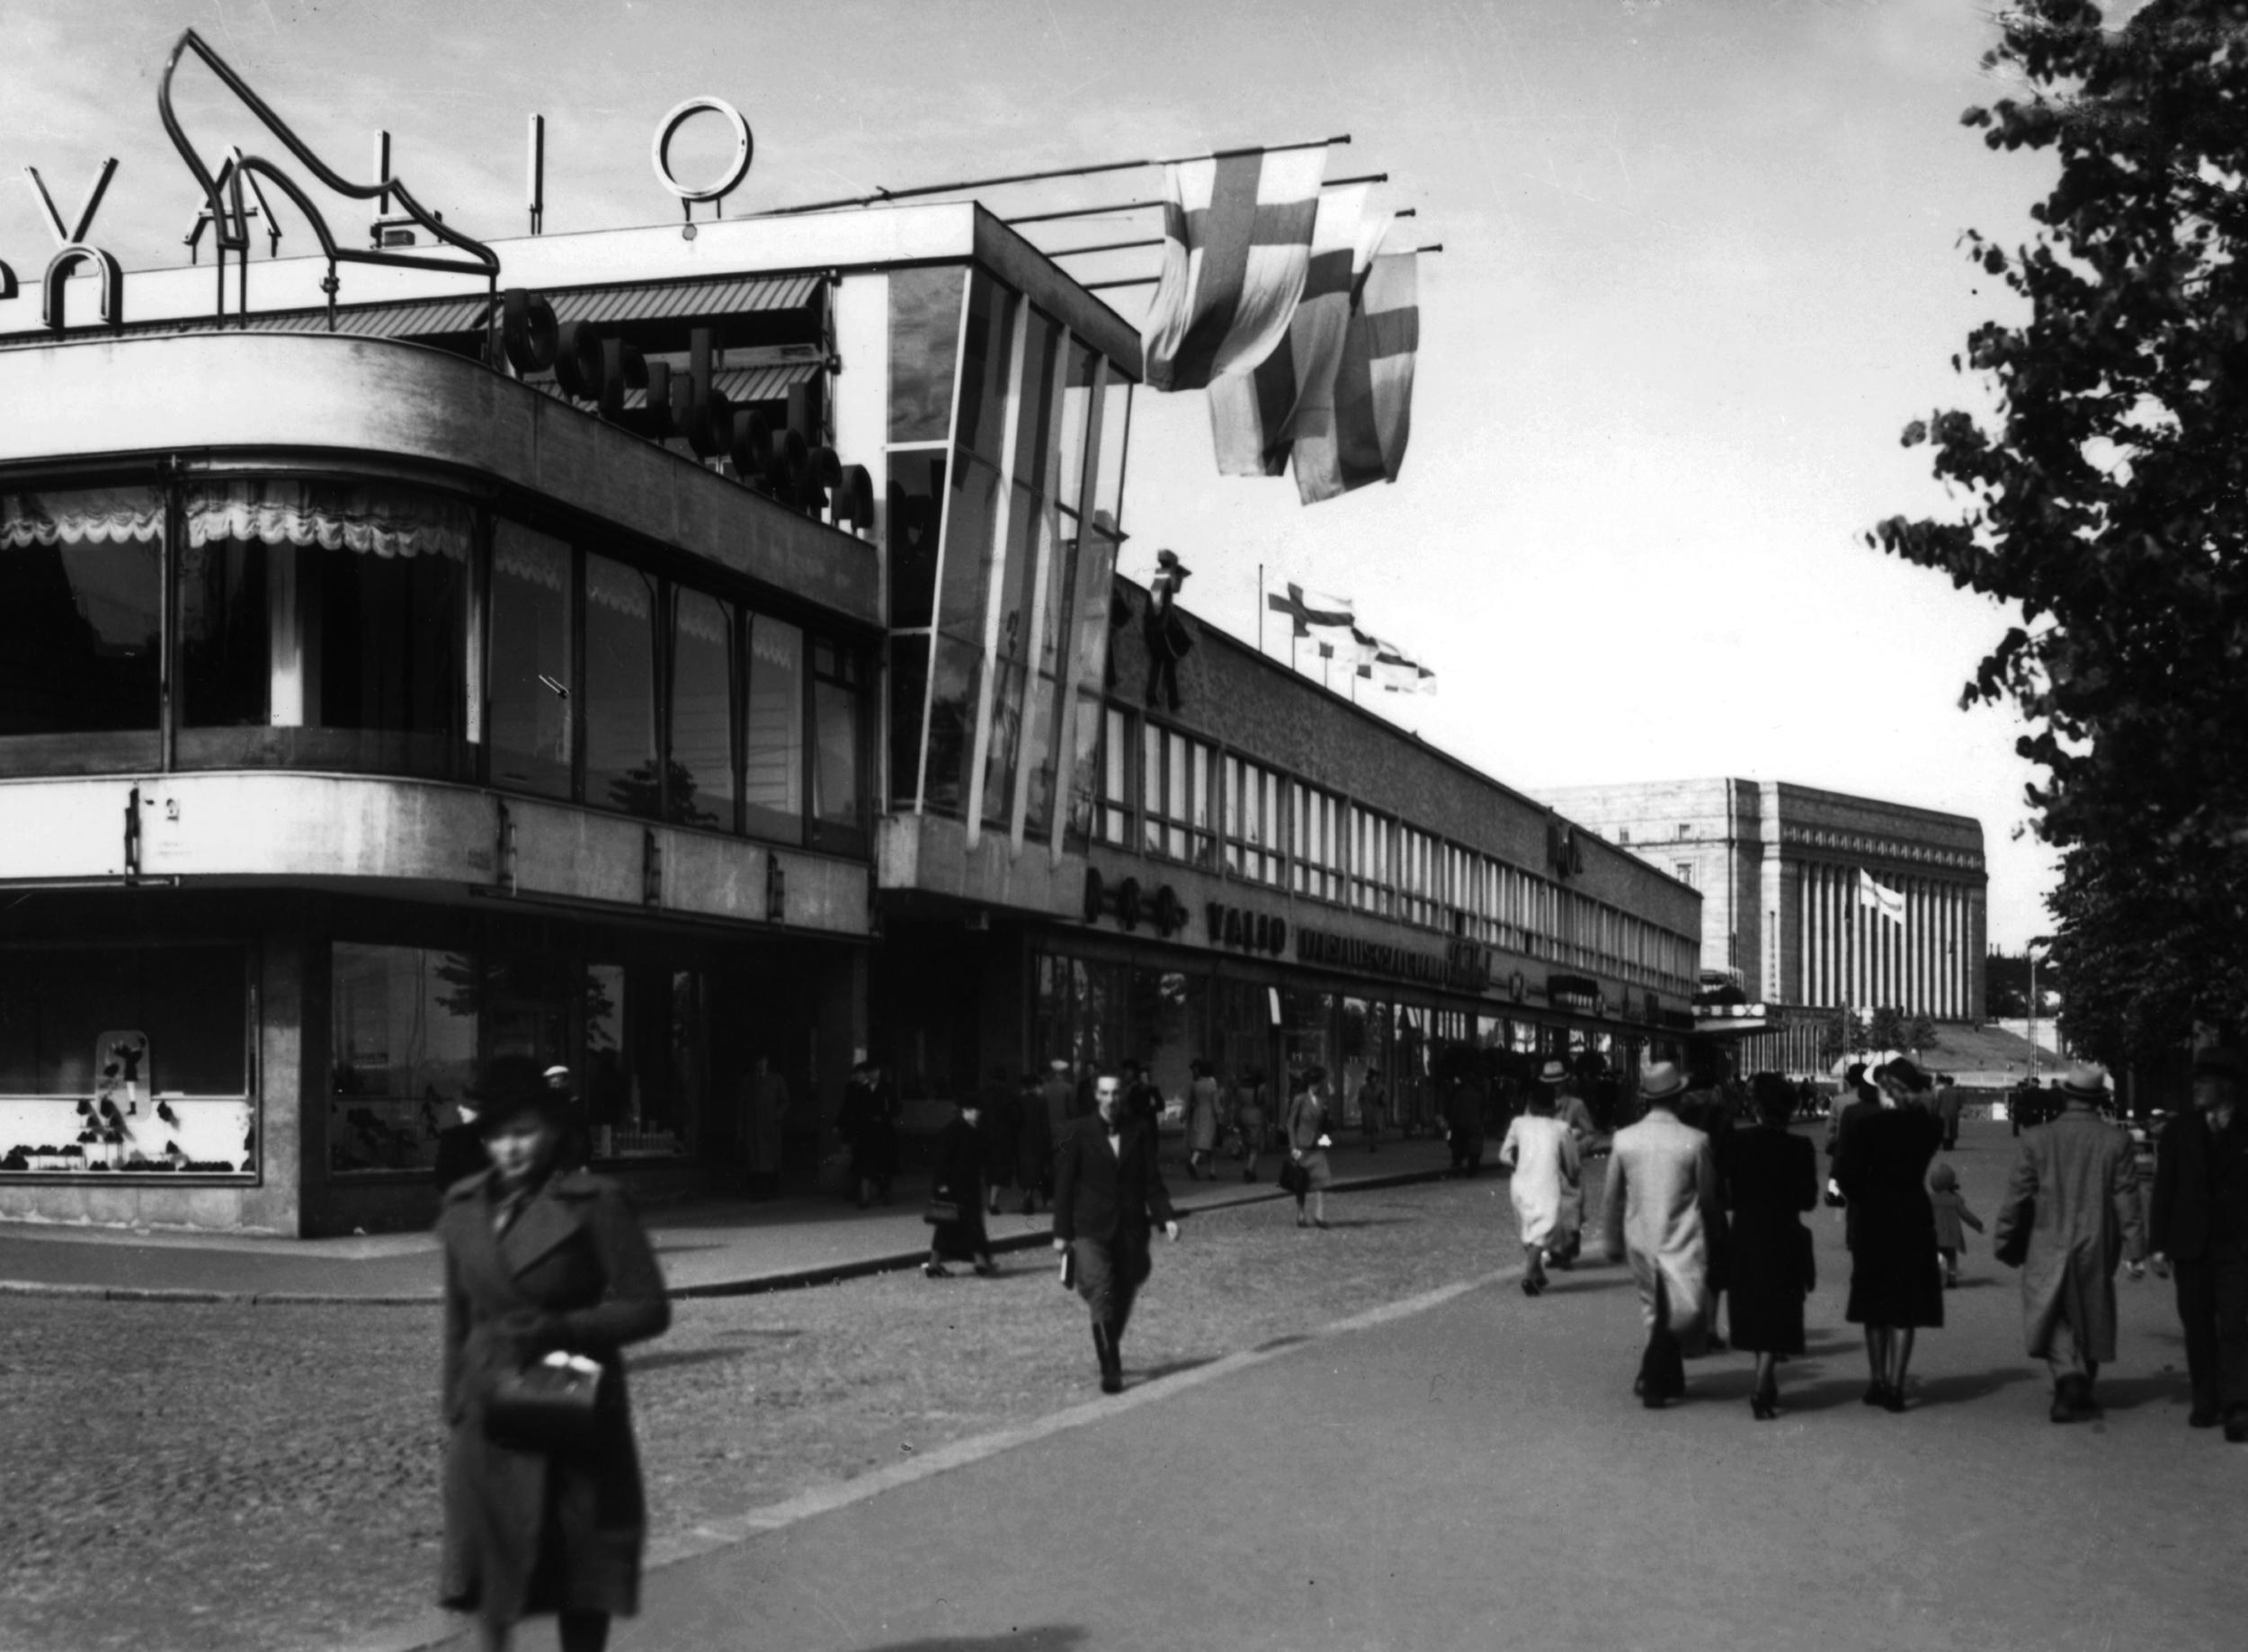 The Lasipalatsi Building